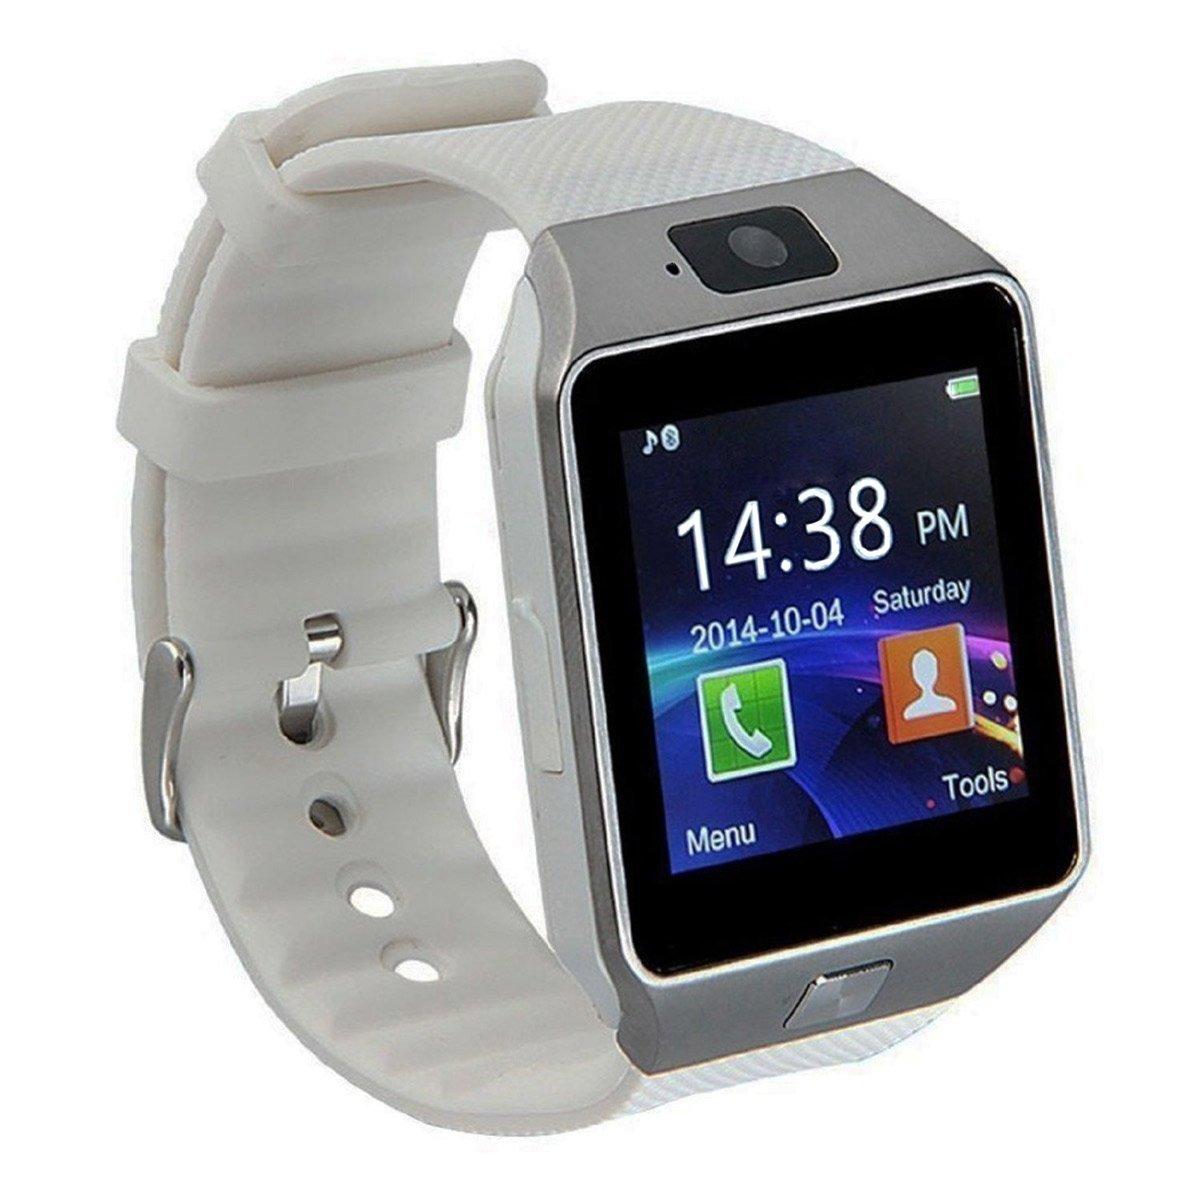 Pandaoo Smart Watch Mobile Phone Unlocked Universal GSM Bluetooth 4.0 Music Player Camera